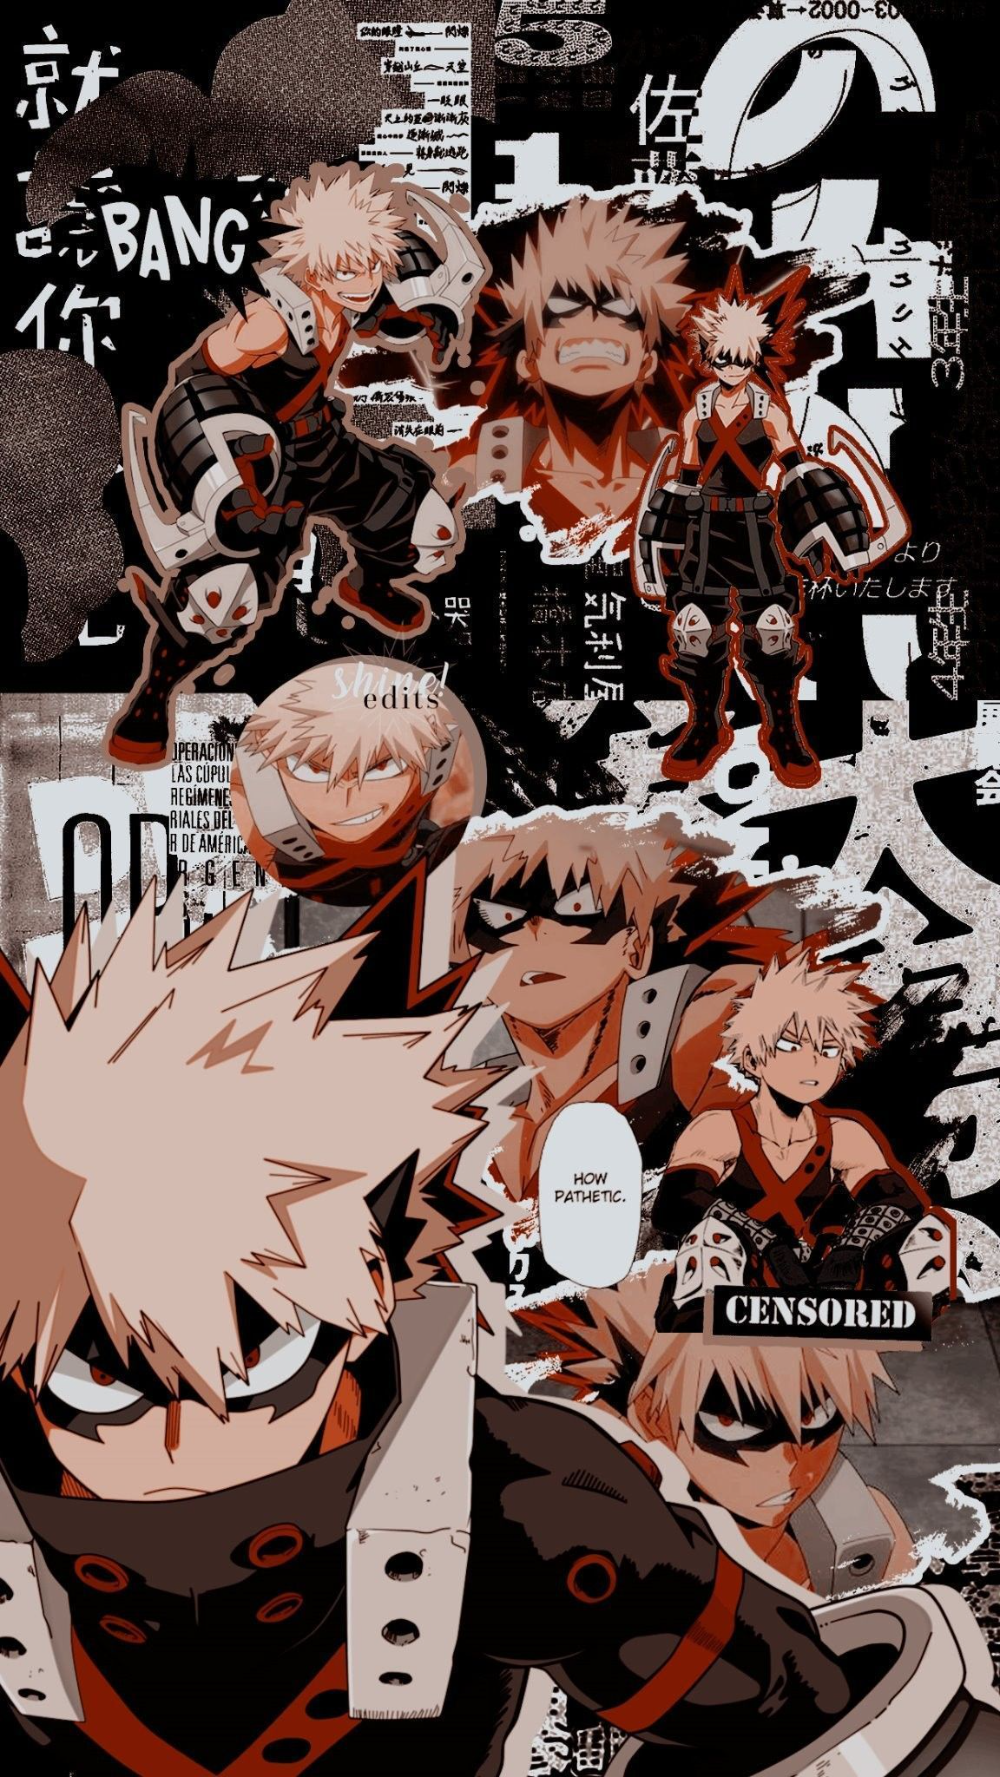 Aesthetic Bakugou Wallpapers Wallpaper Cave Animais Amorosos Wallpapers Bonitos Otaku Anime